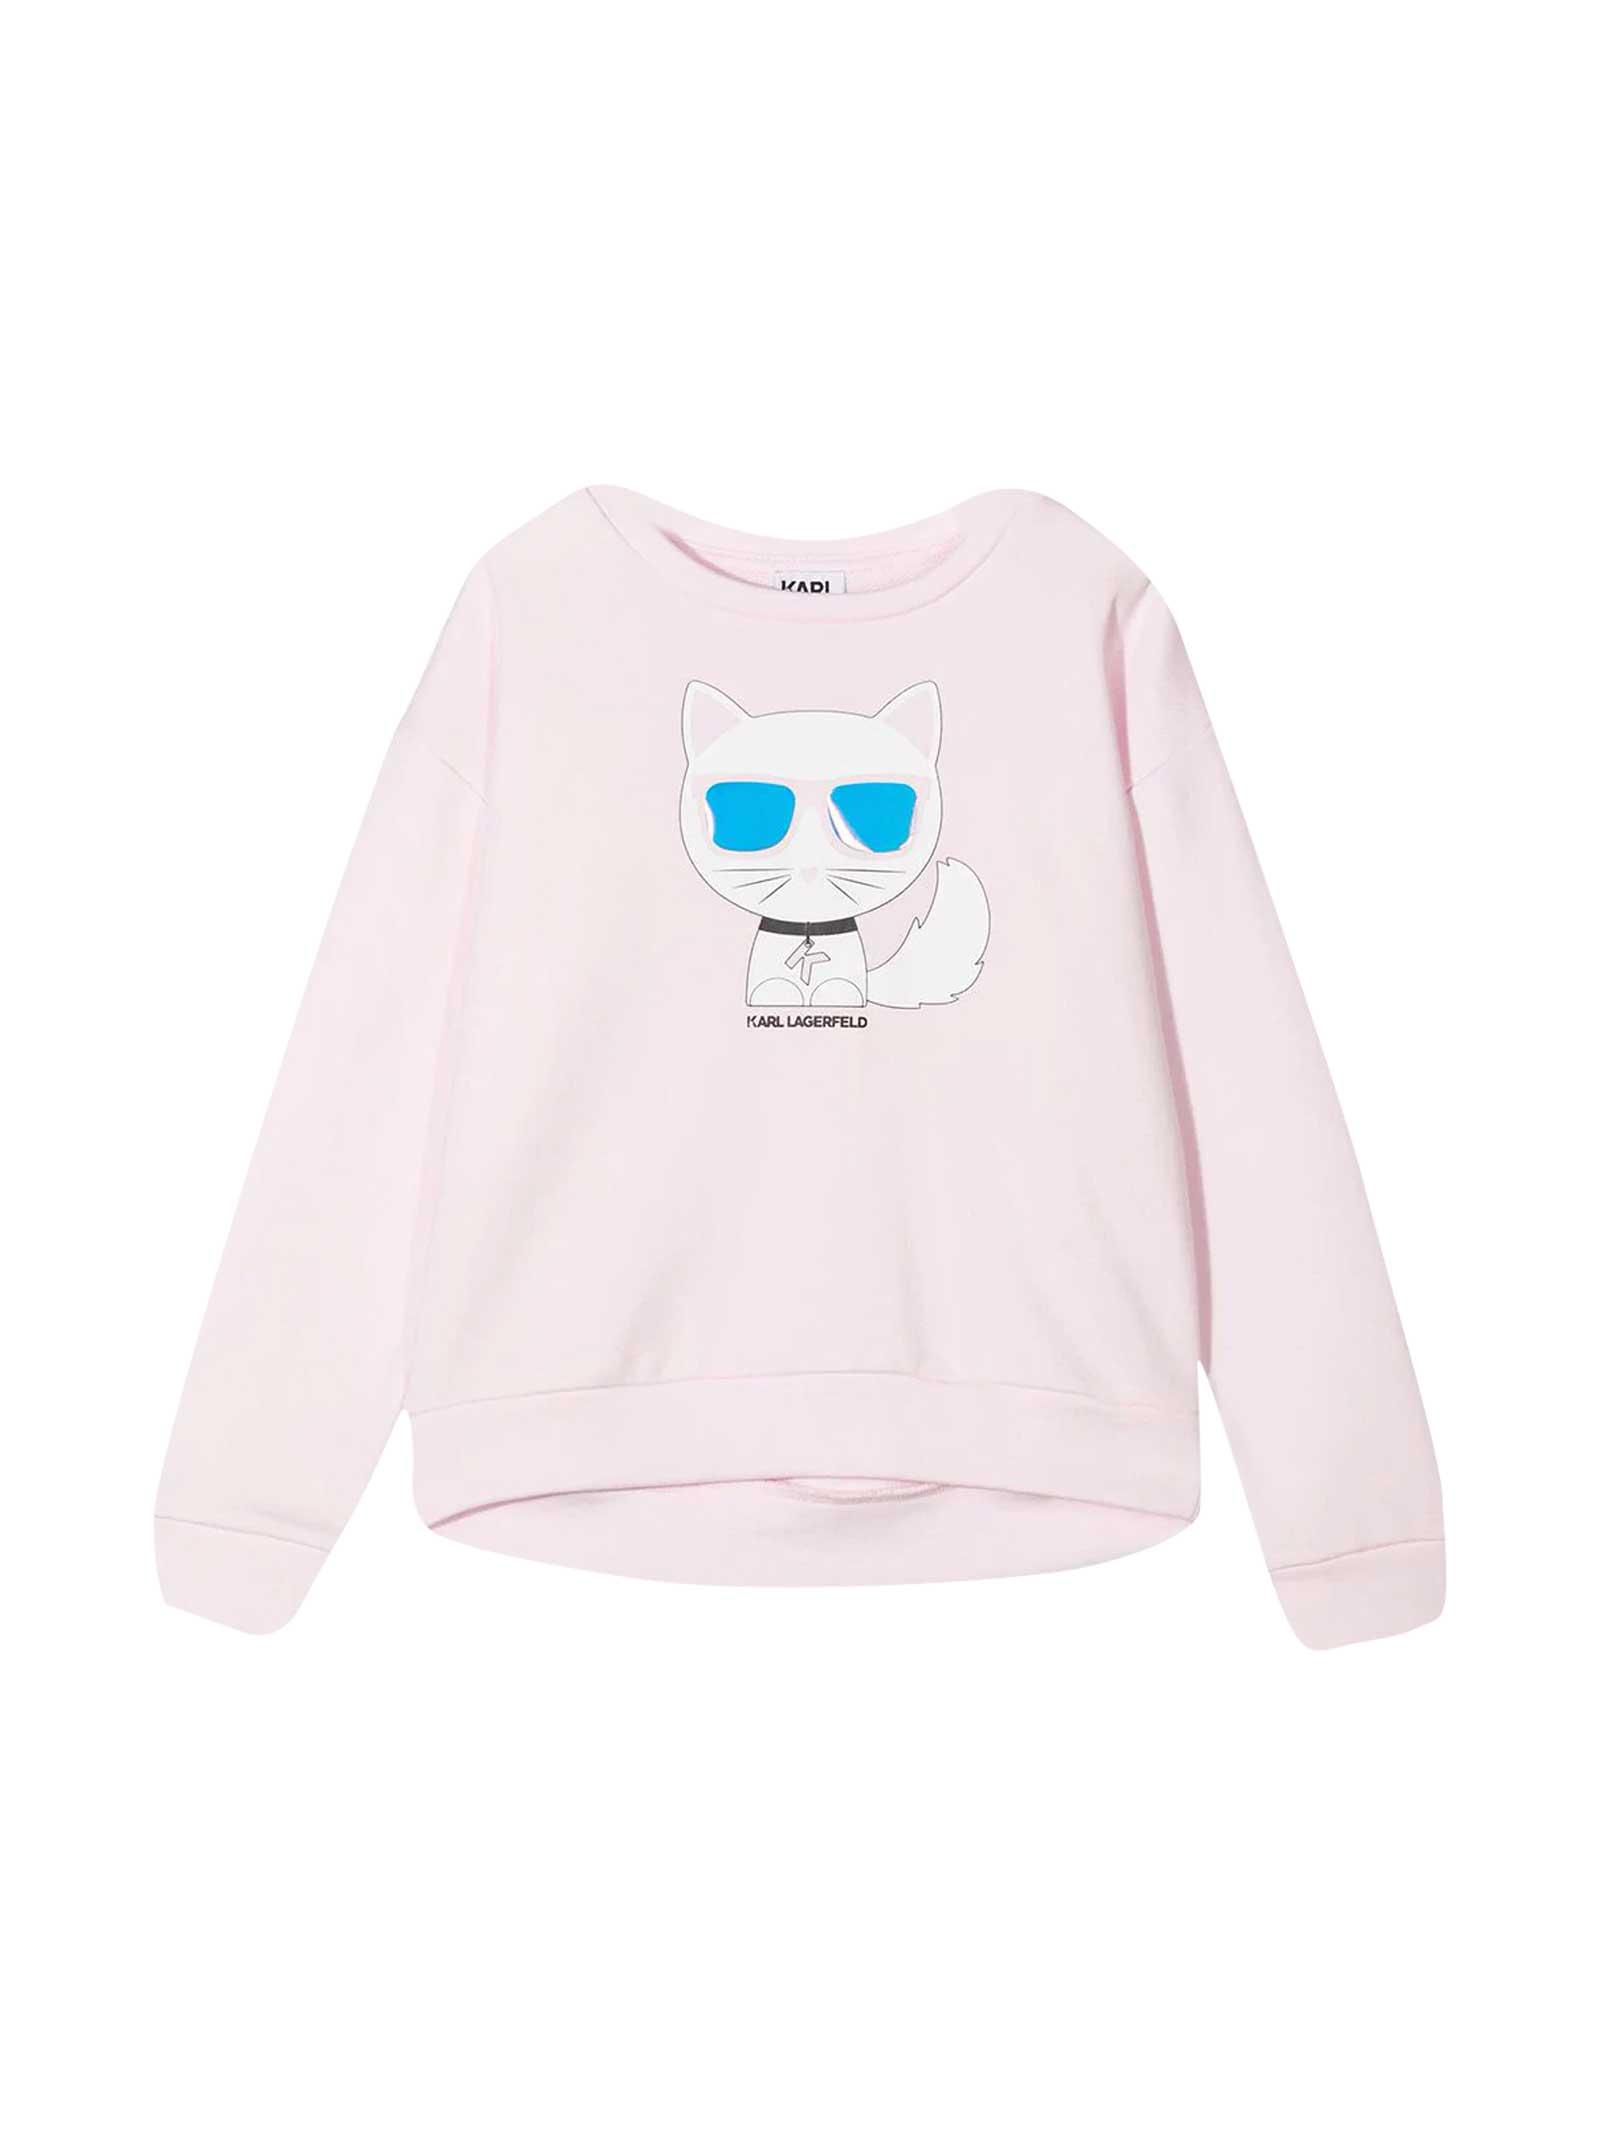 Karl Lagerfeld Kids Choupette Sweatshirt